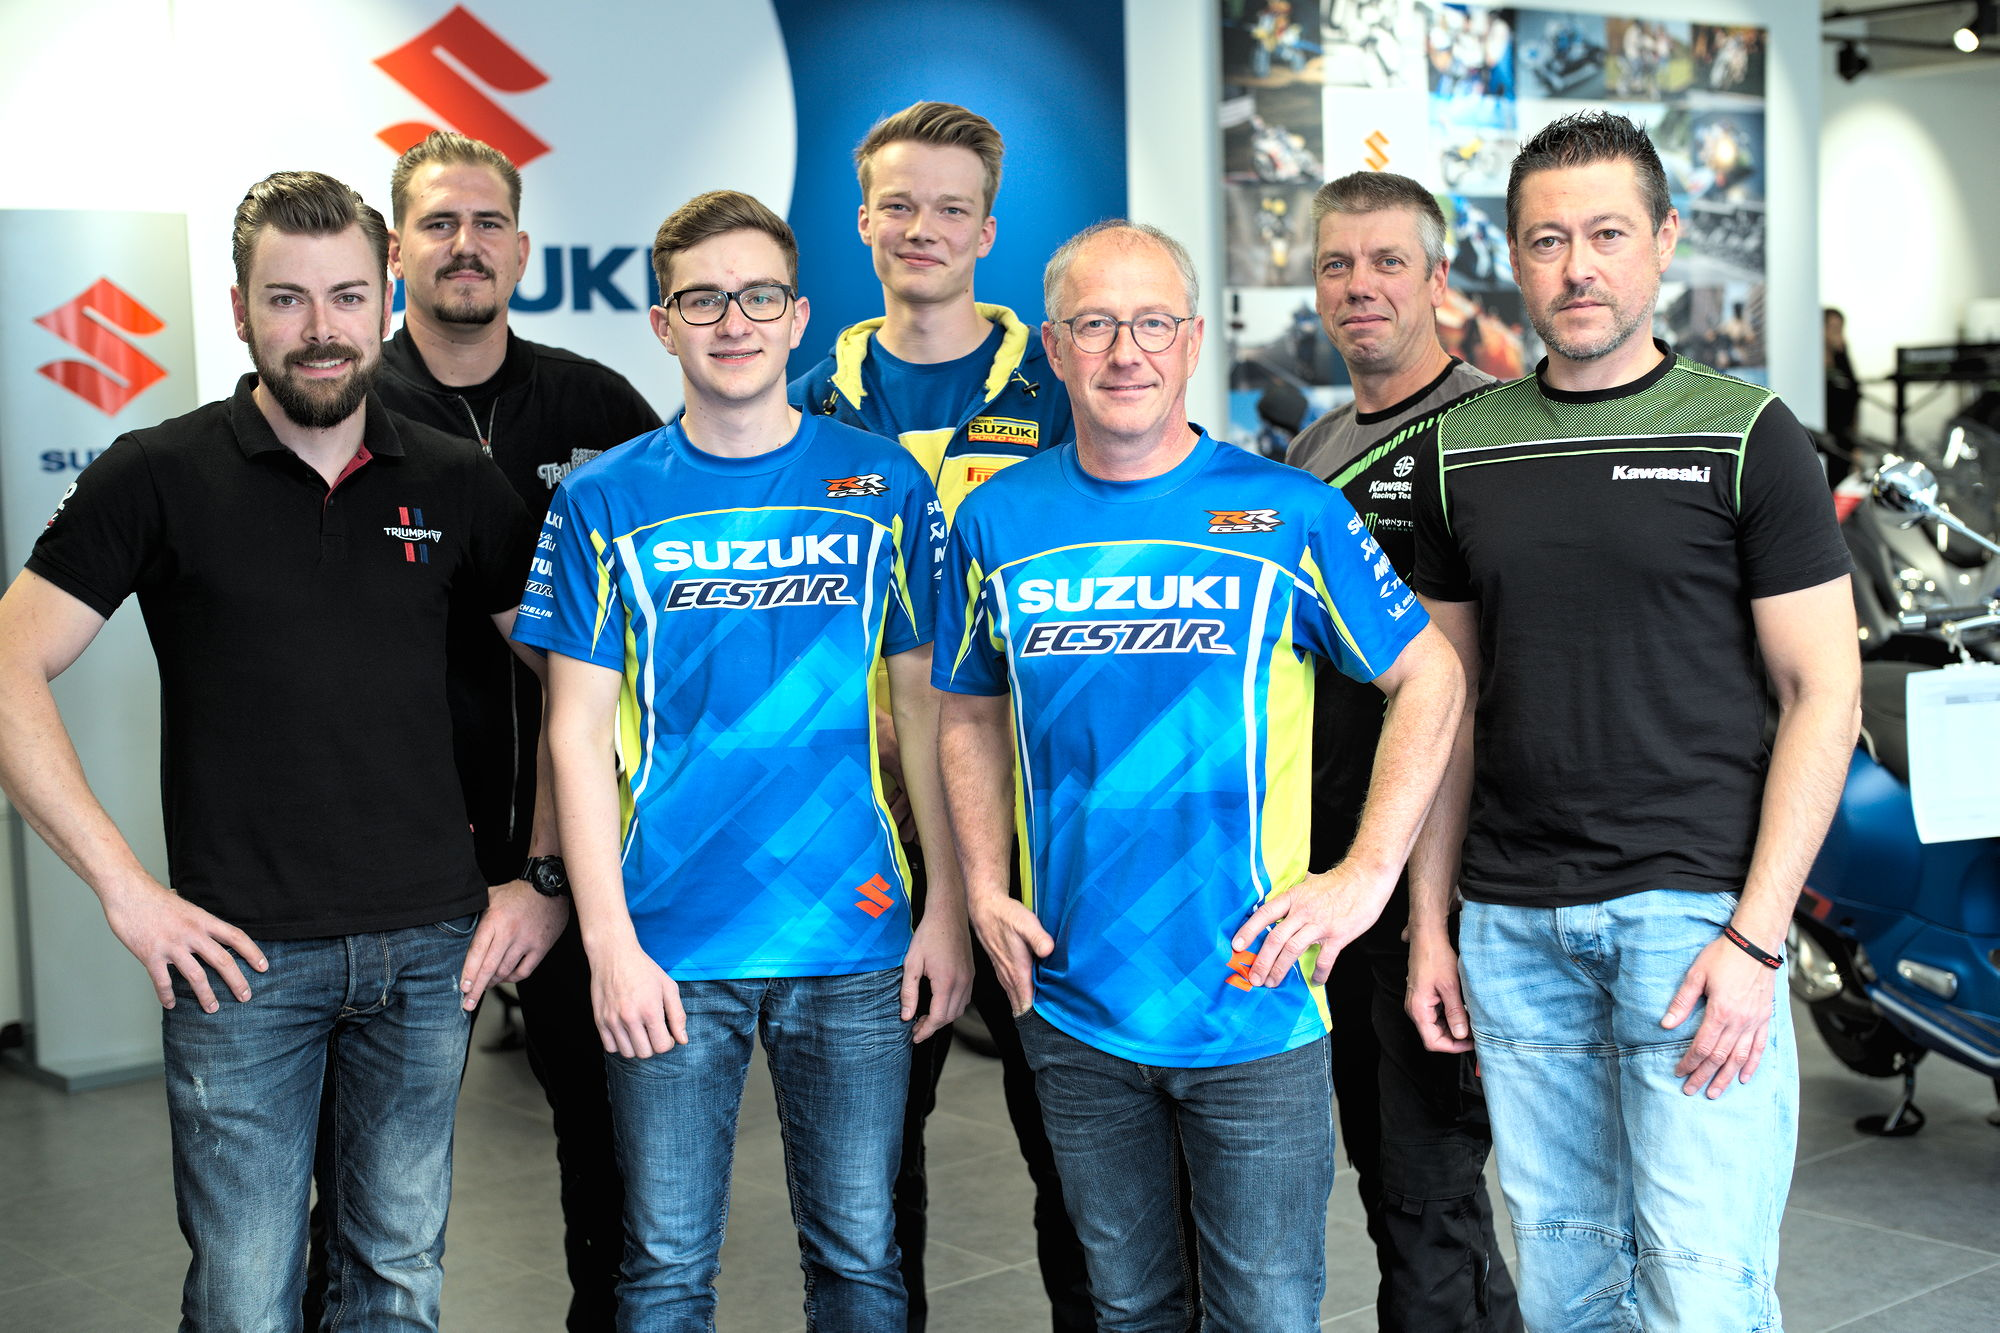 Motorrad Debus Team Siegen, NRW.